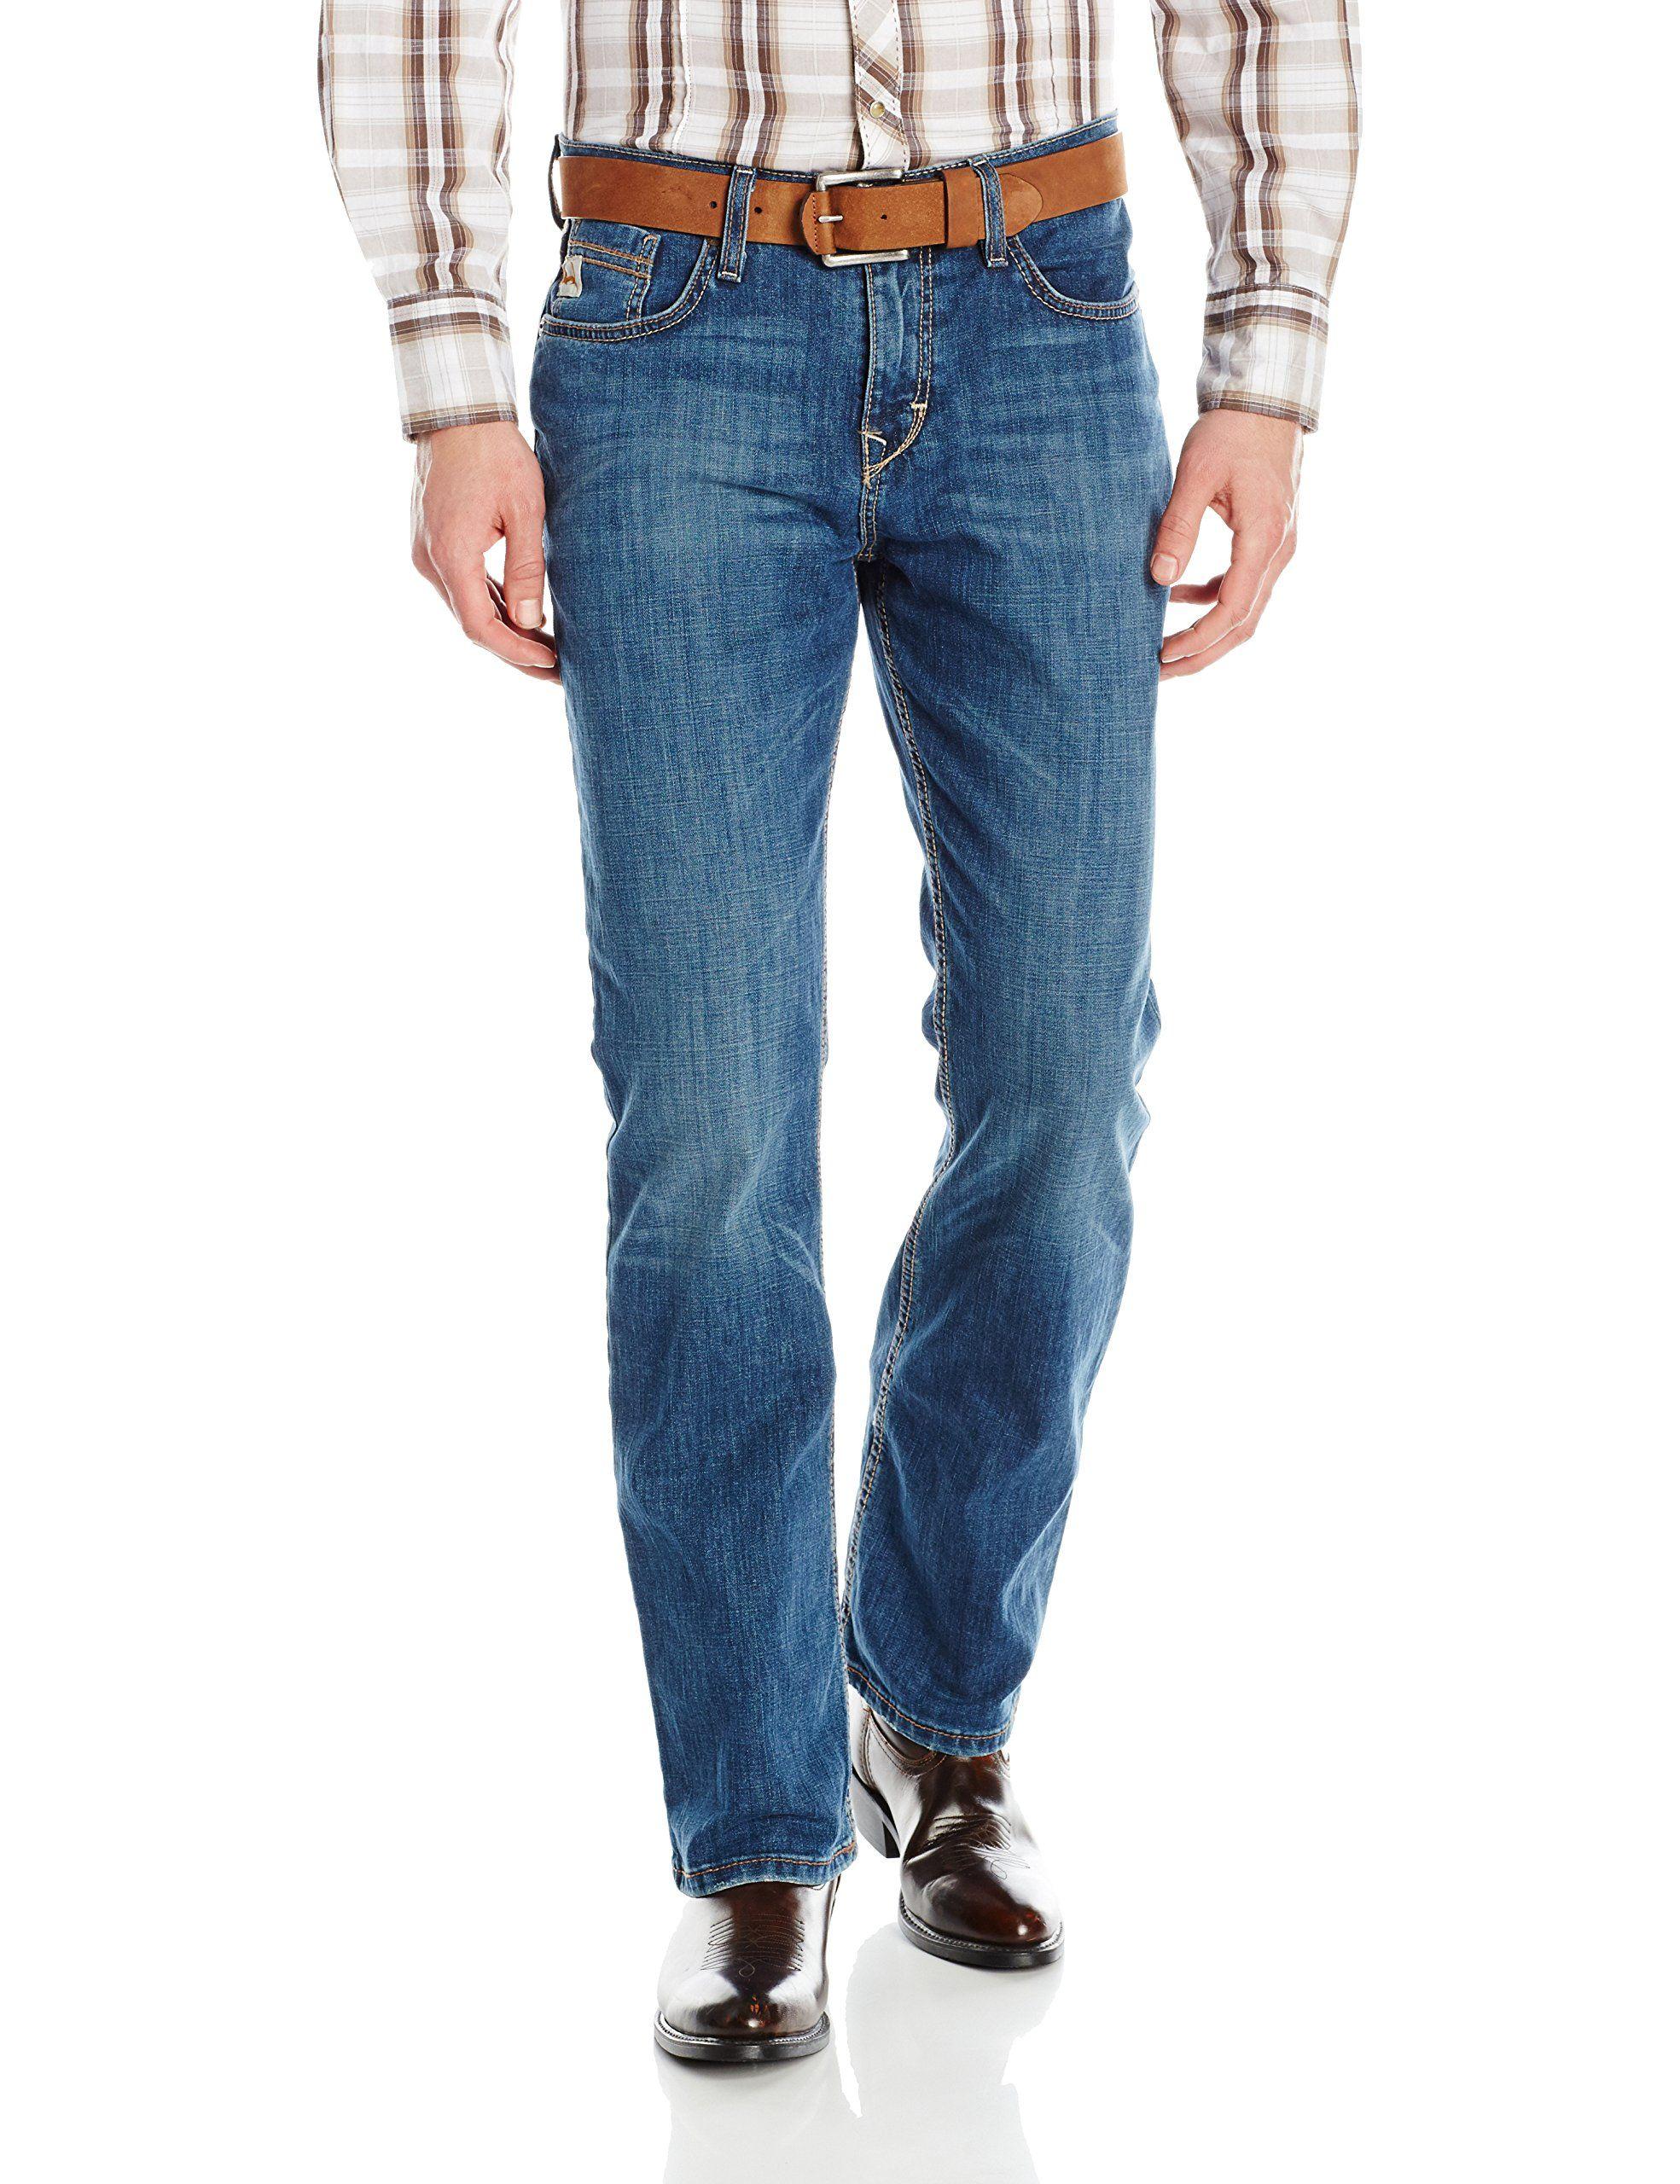 Cinch Men's Ian Slim Fit Jean, Performance Whiskered Stonewash, 34W x 38L